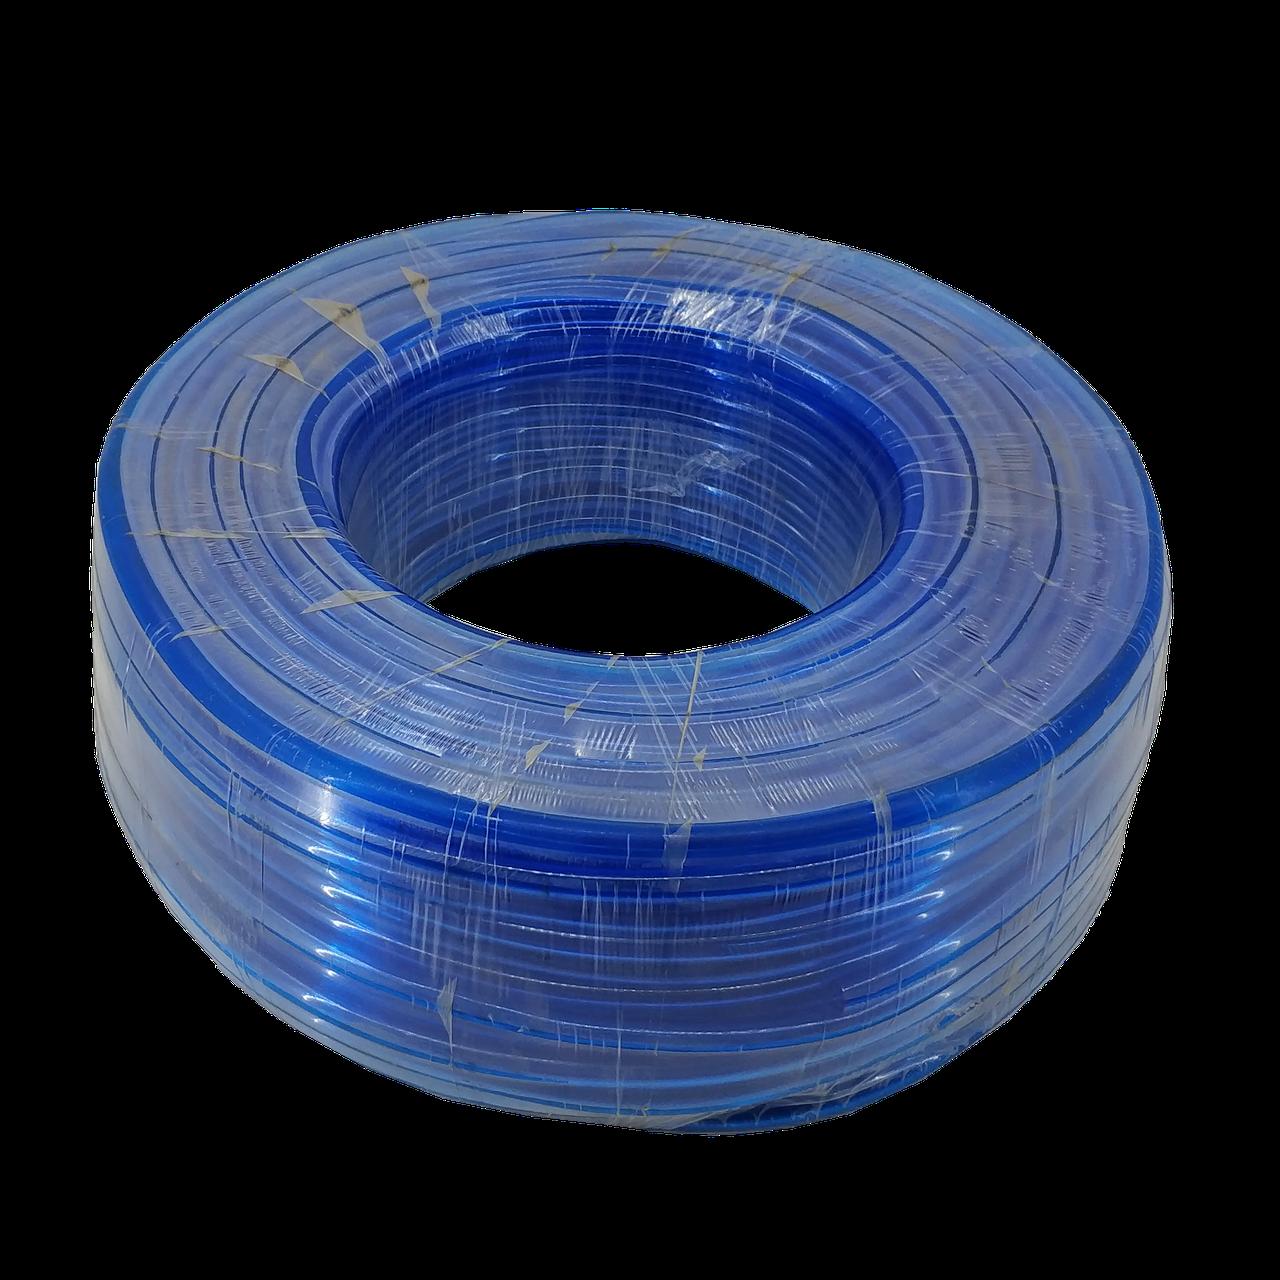 ПВХ трубка в рулоне D=8 мм L=10м (цена за 1 м) (заводская упаковка - 100 м.)